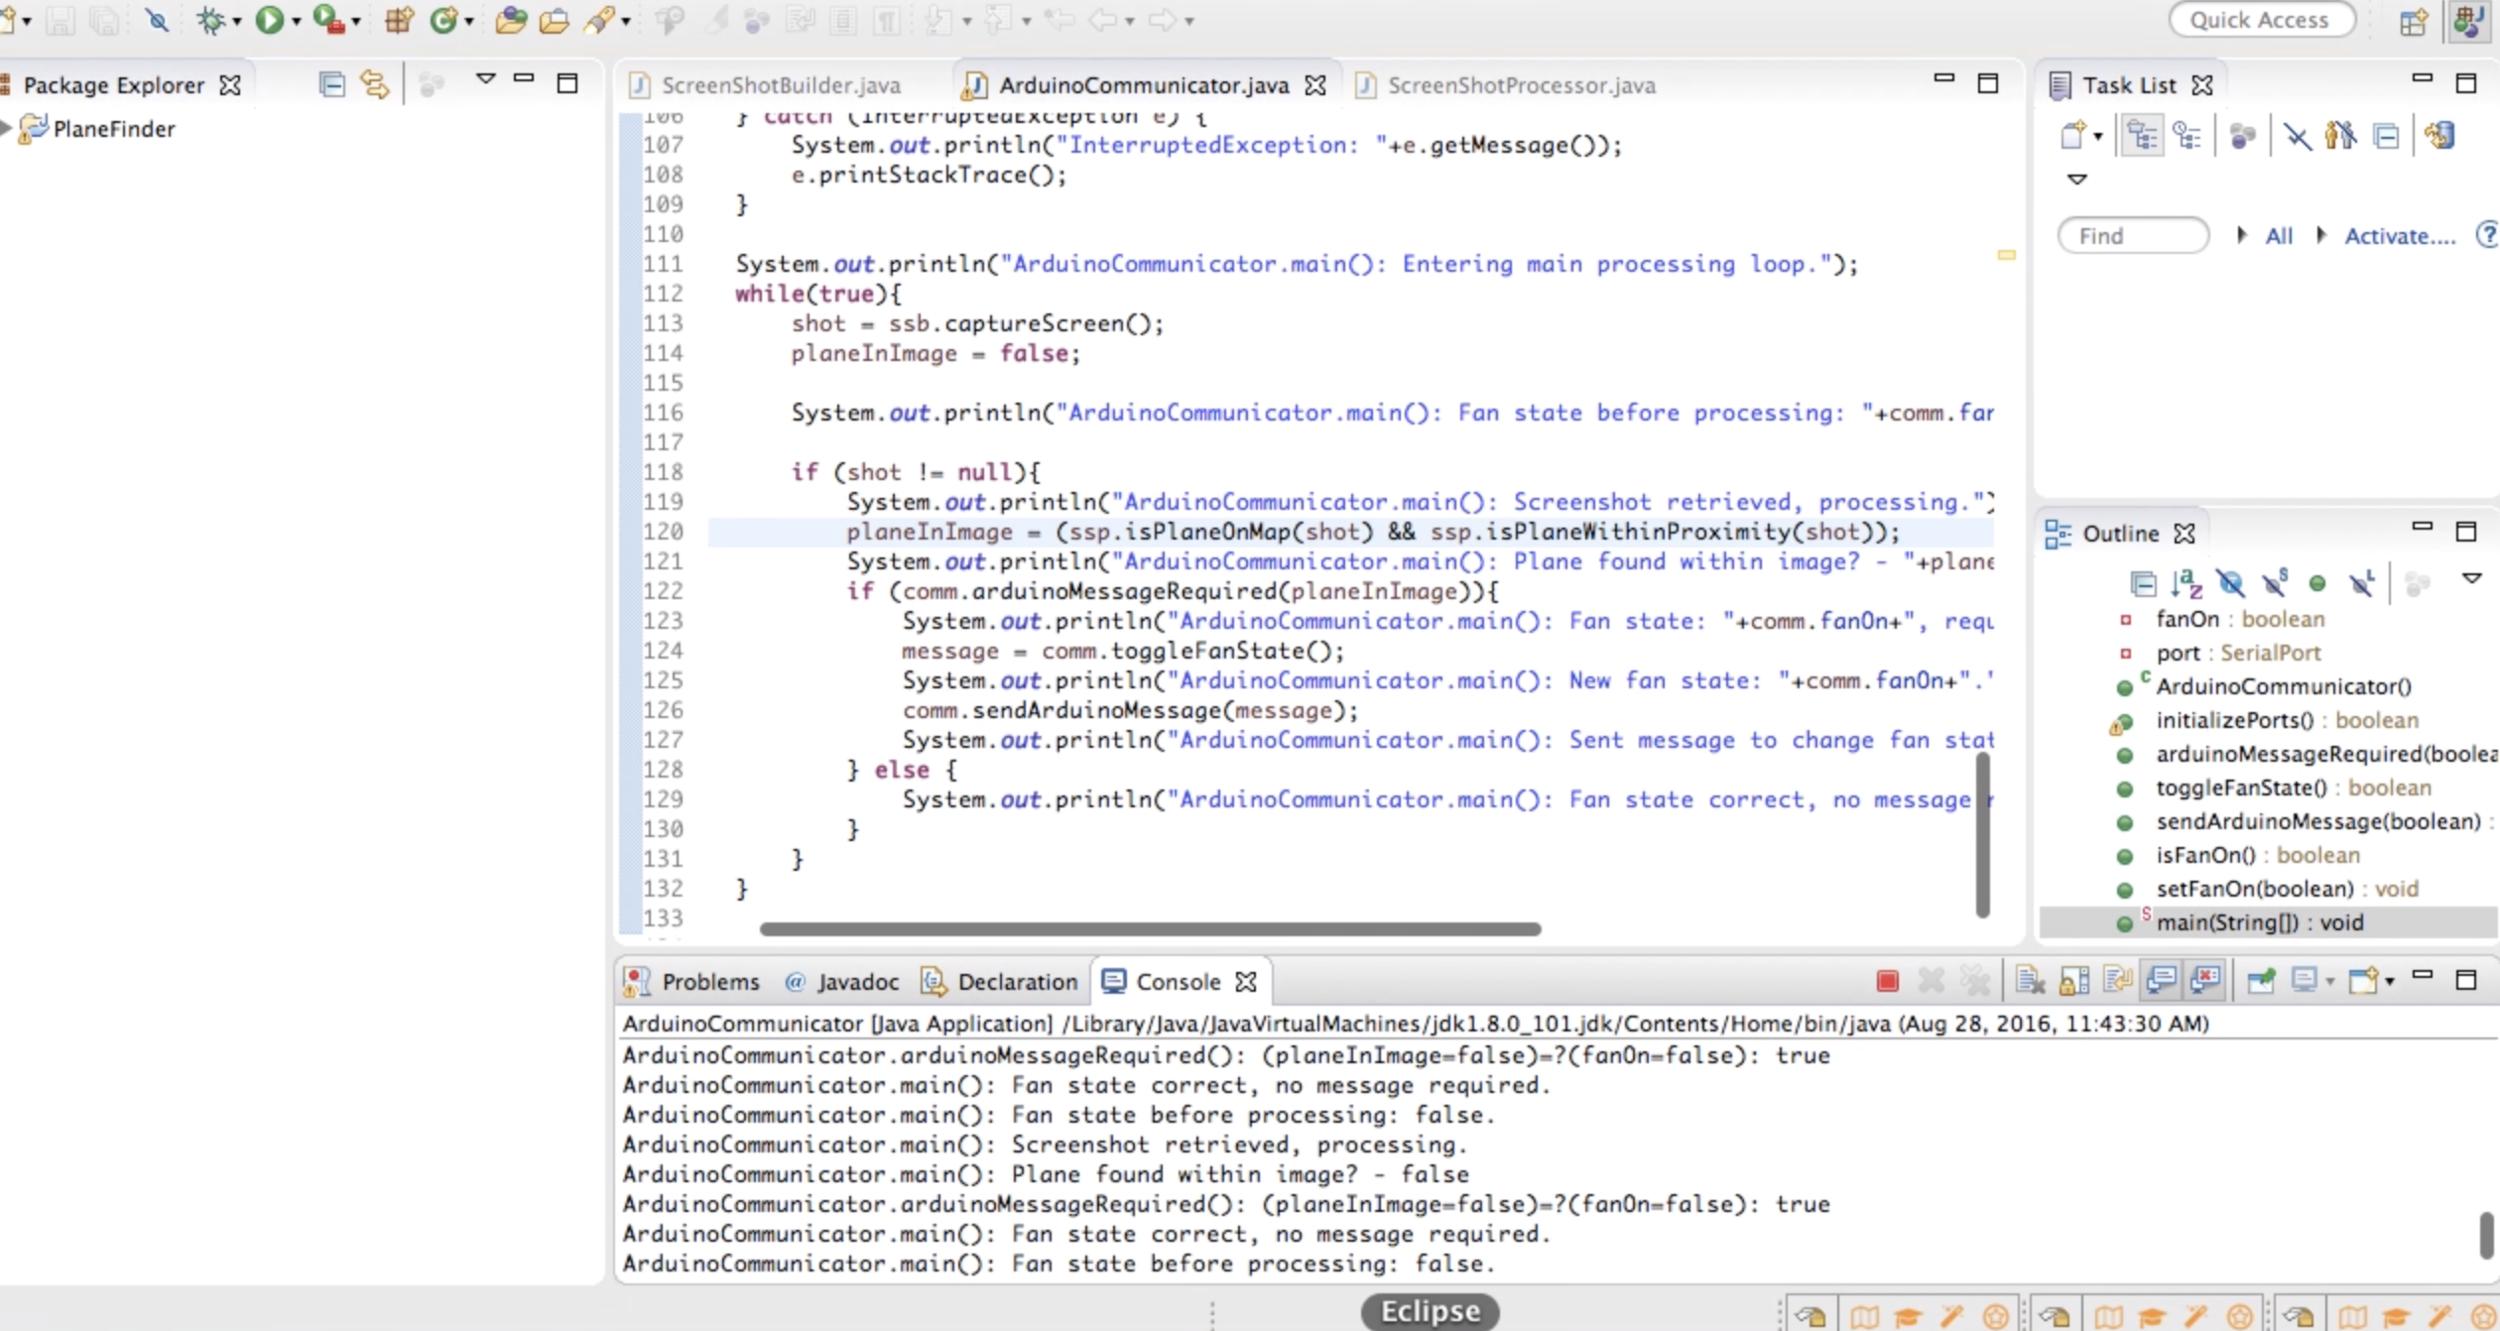 Screenshot of JavaScript and Eclipse triggering Arduino based off of Flightradar24.com